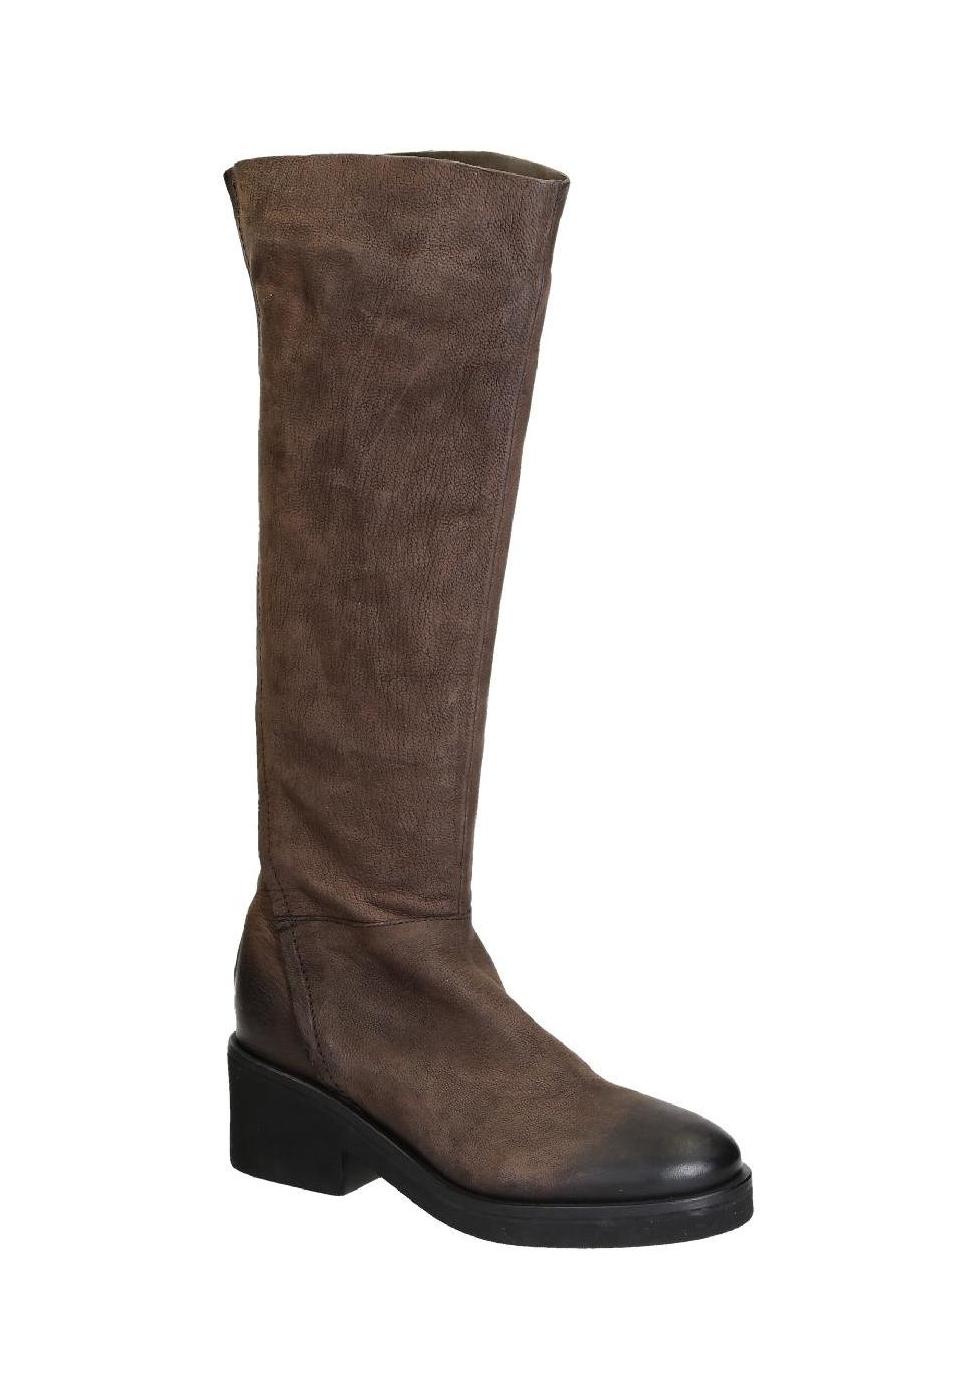 4d5c470776 Stivali al ginocchio Vic Matié in pelle marrone - Italian Boutique